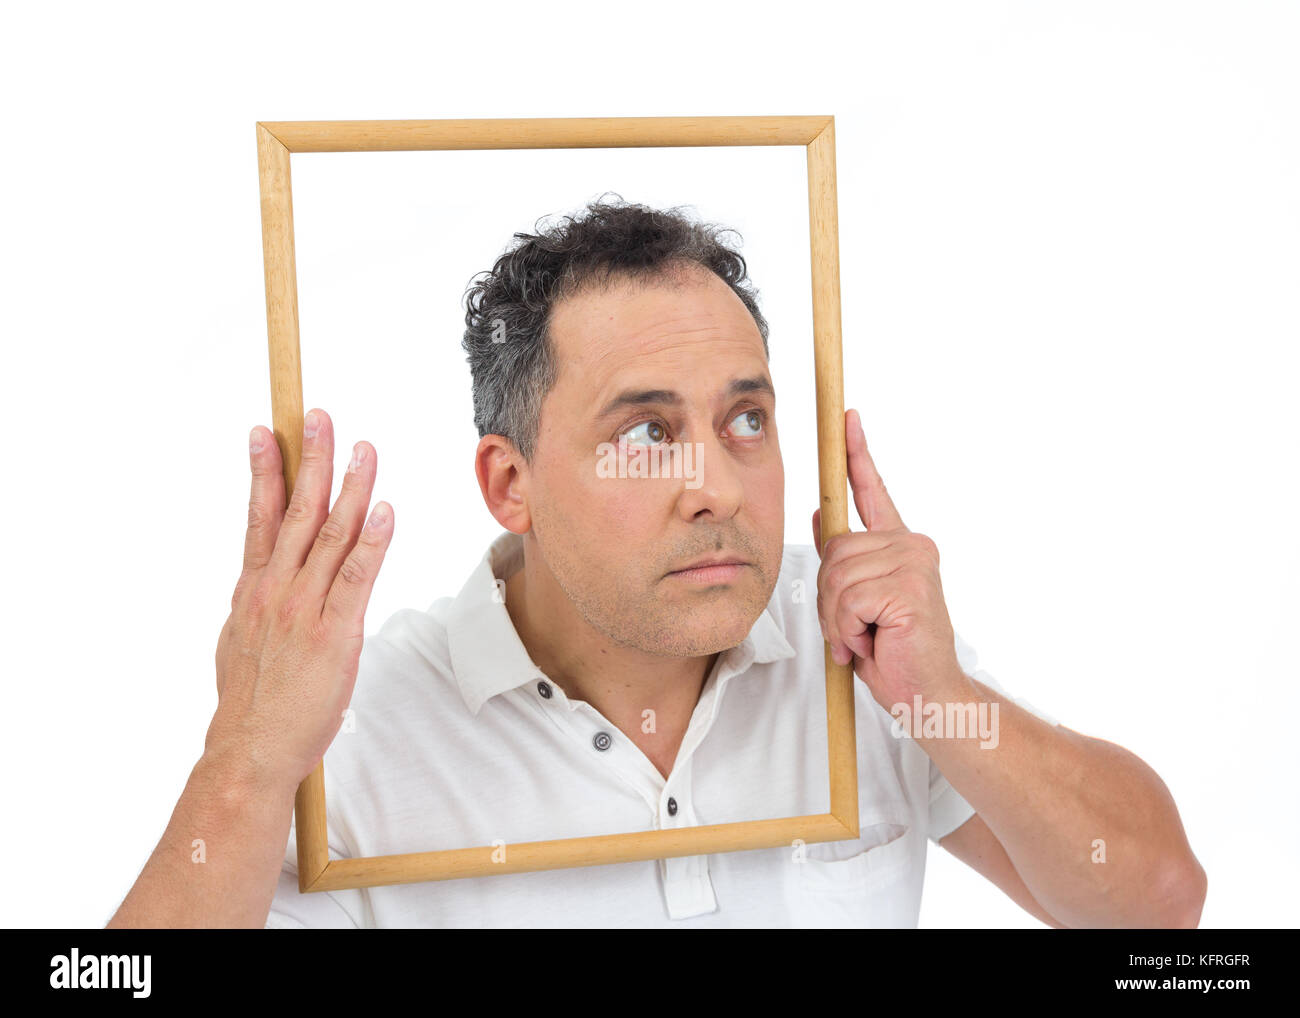 Artista es divertido mirar a través del marco de la imagen. El ...